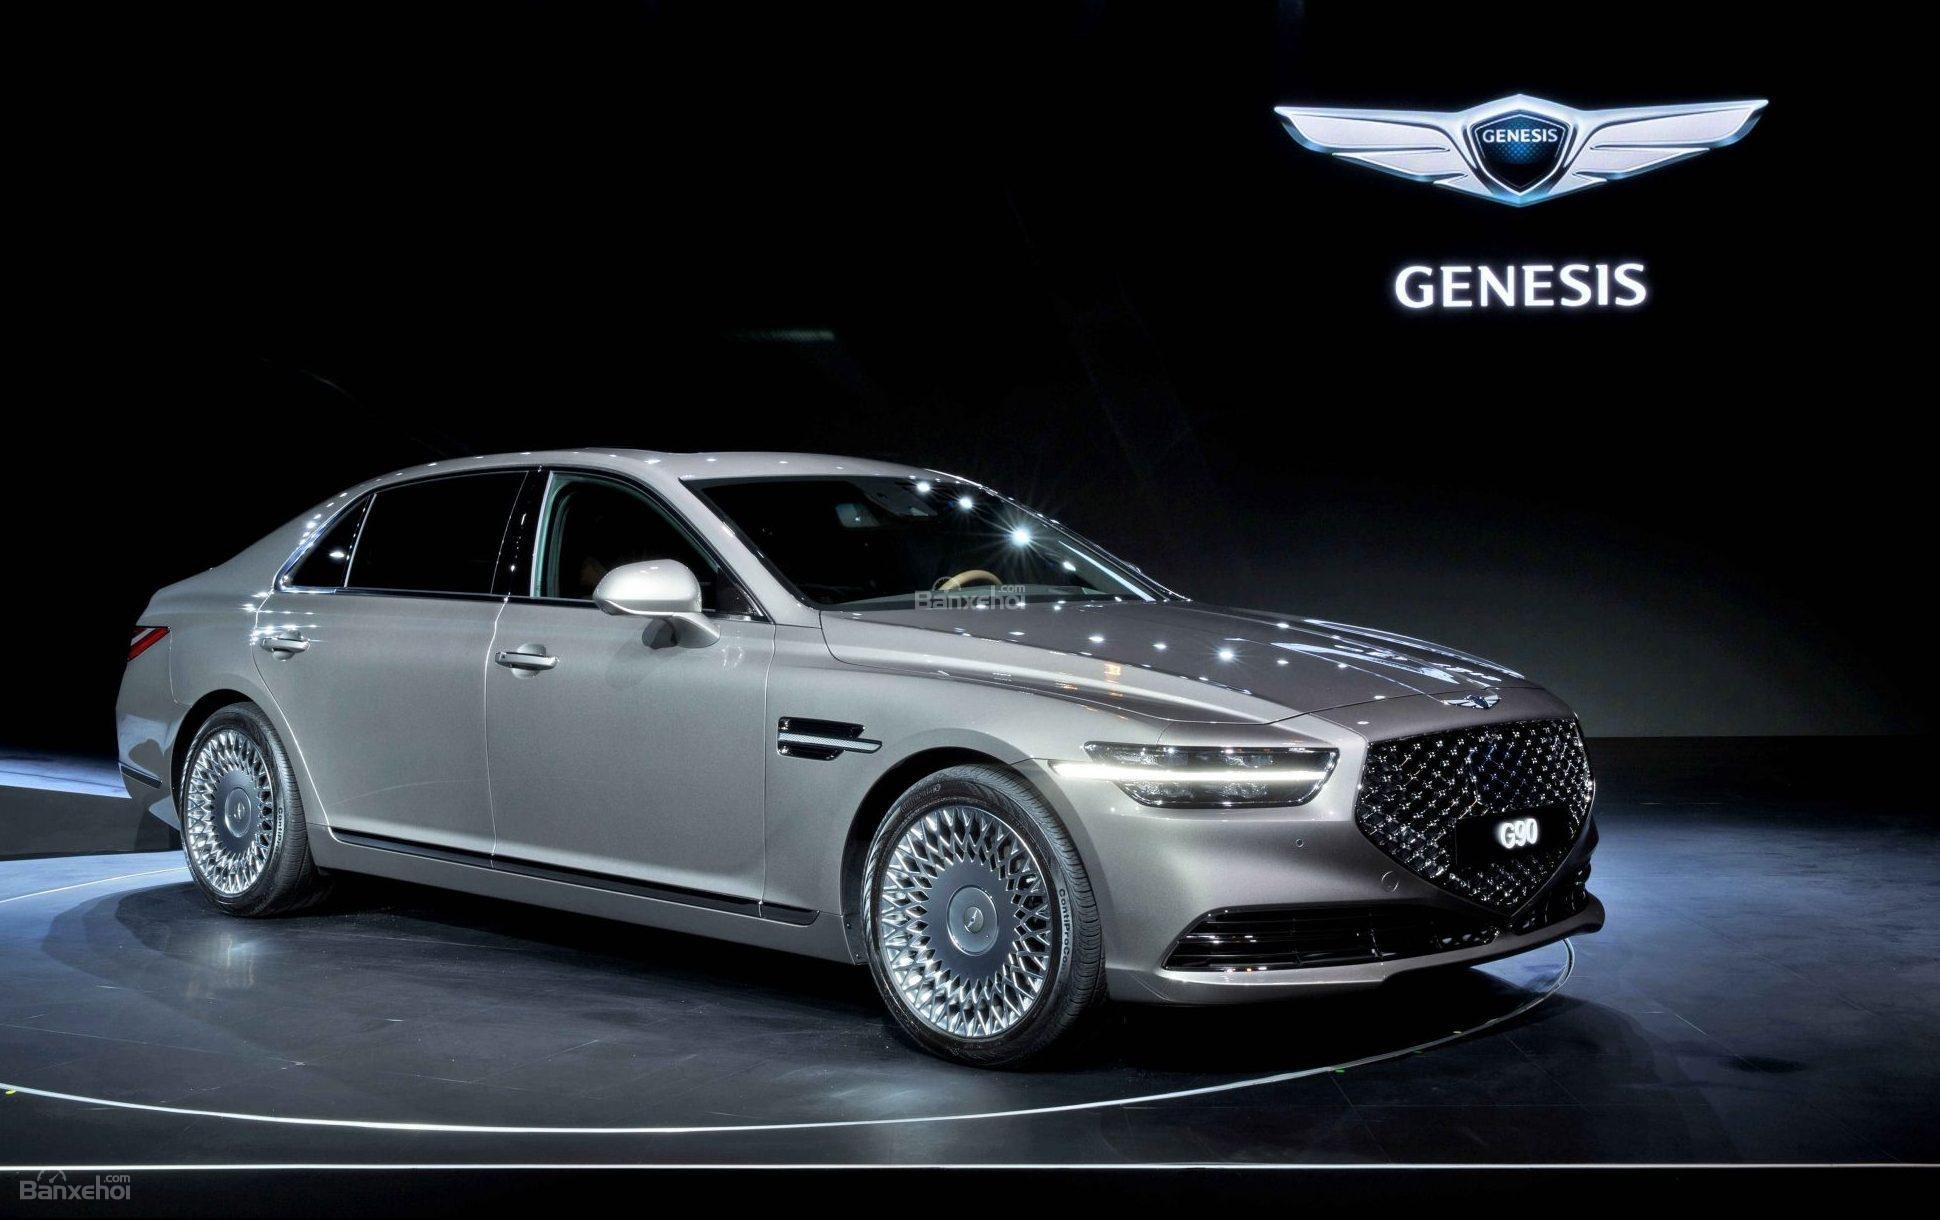 Genesis G90 mẫu xe sang của Hyundai